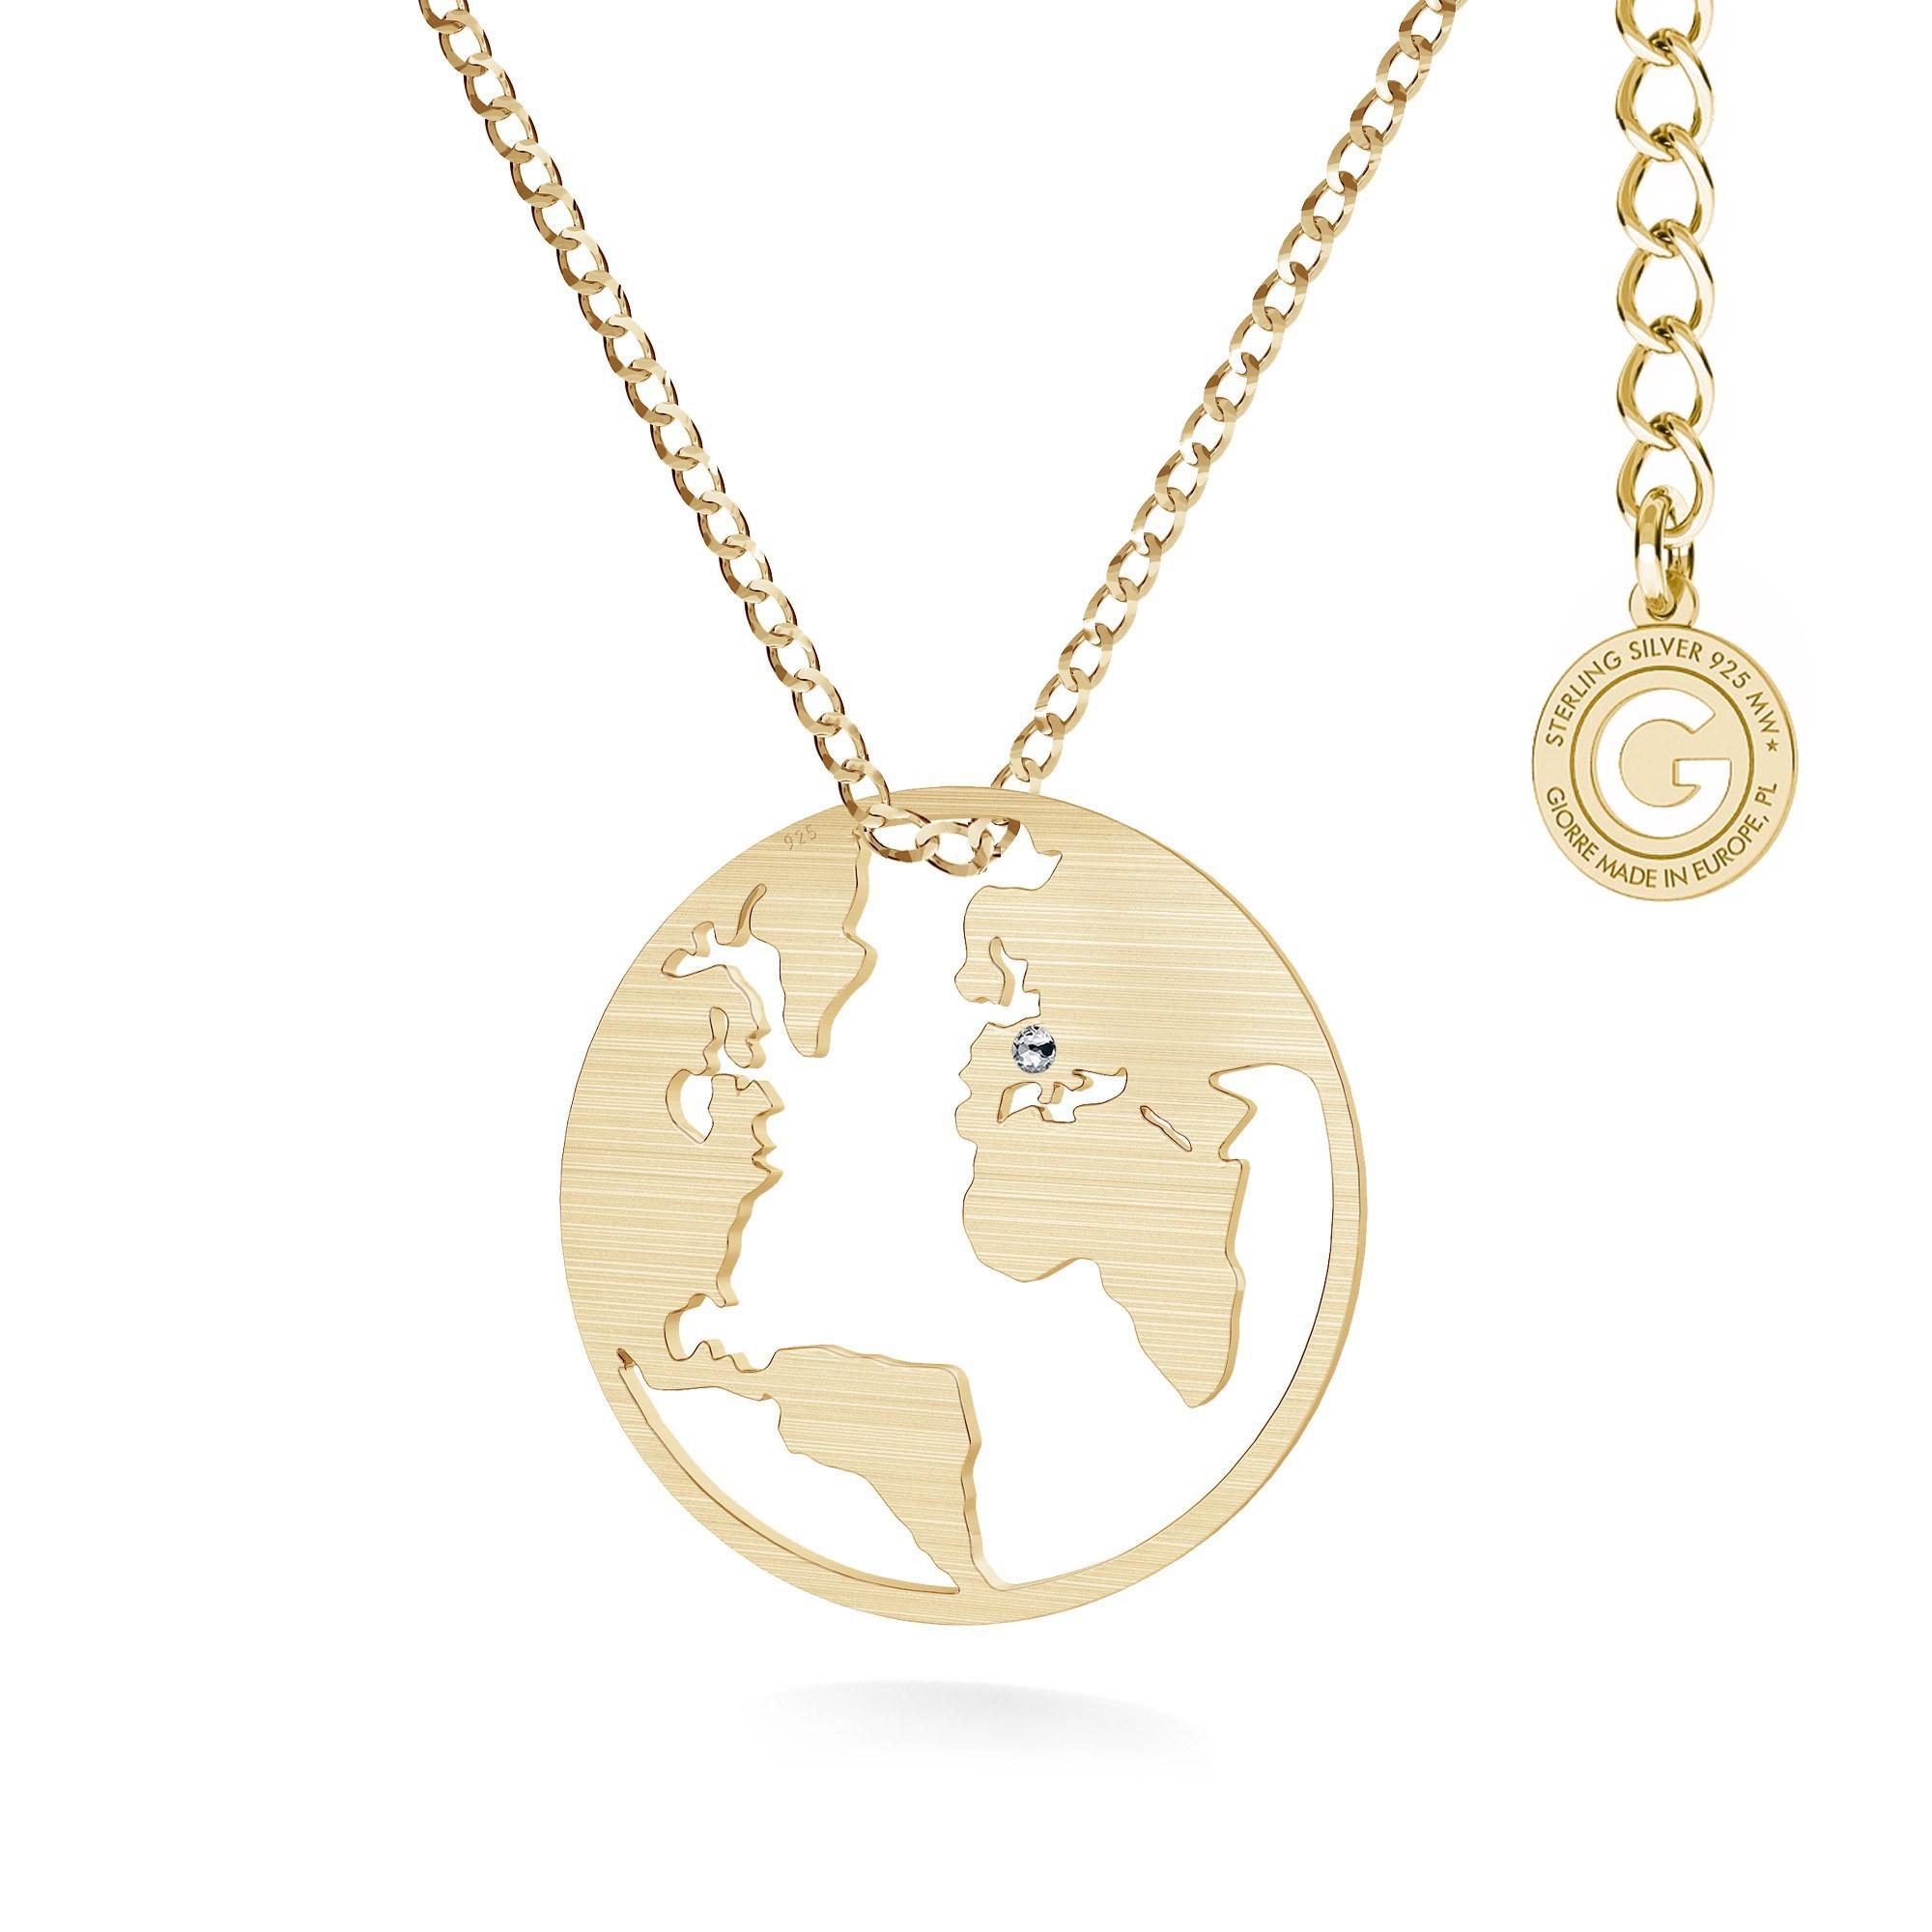 MON DÉFI Necklace - Globe, satin silver 925 curb chain